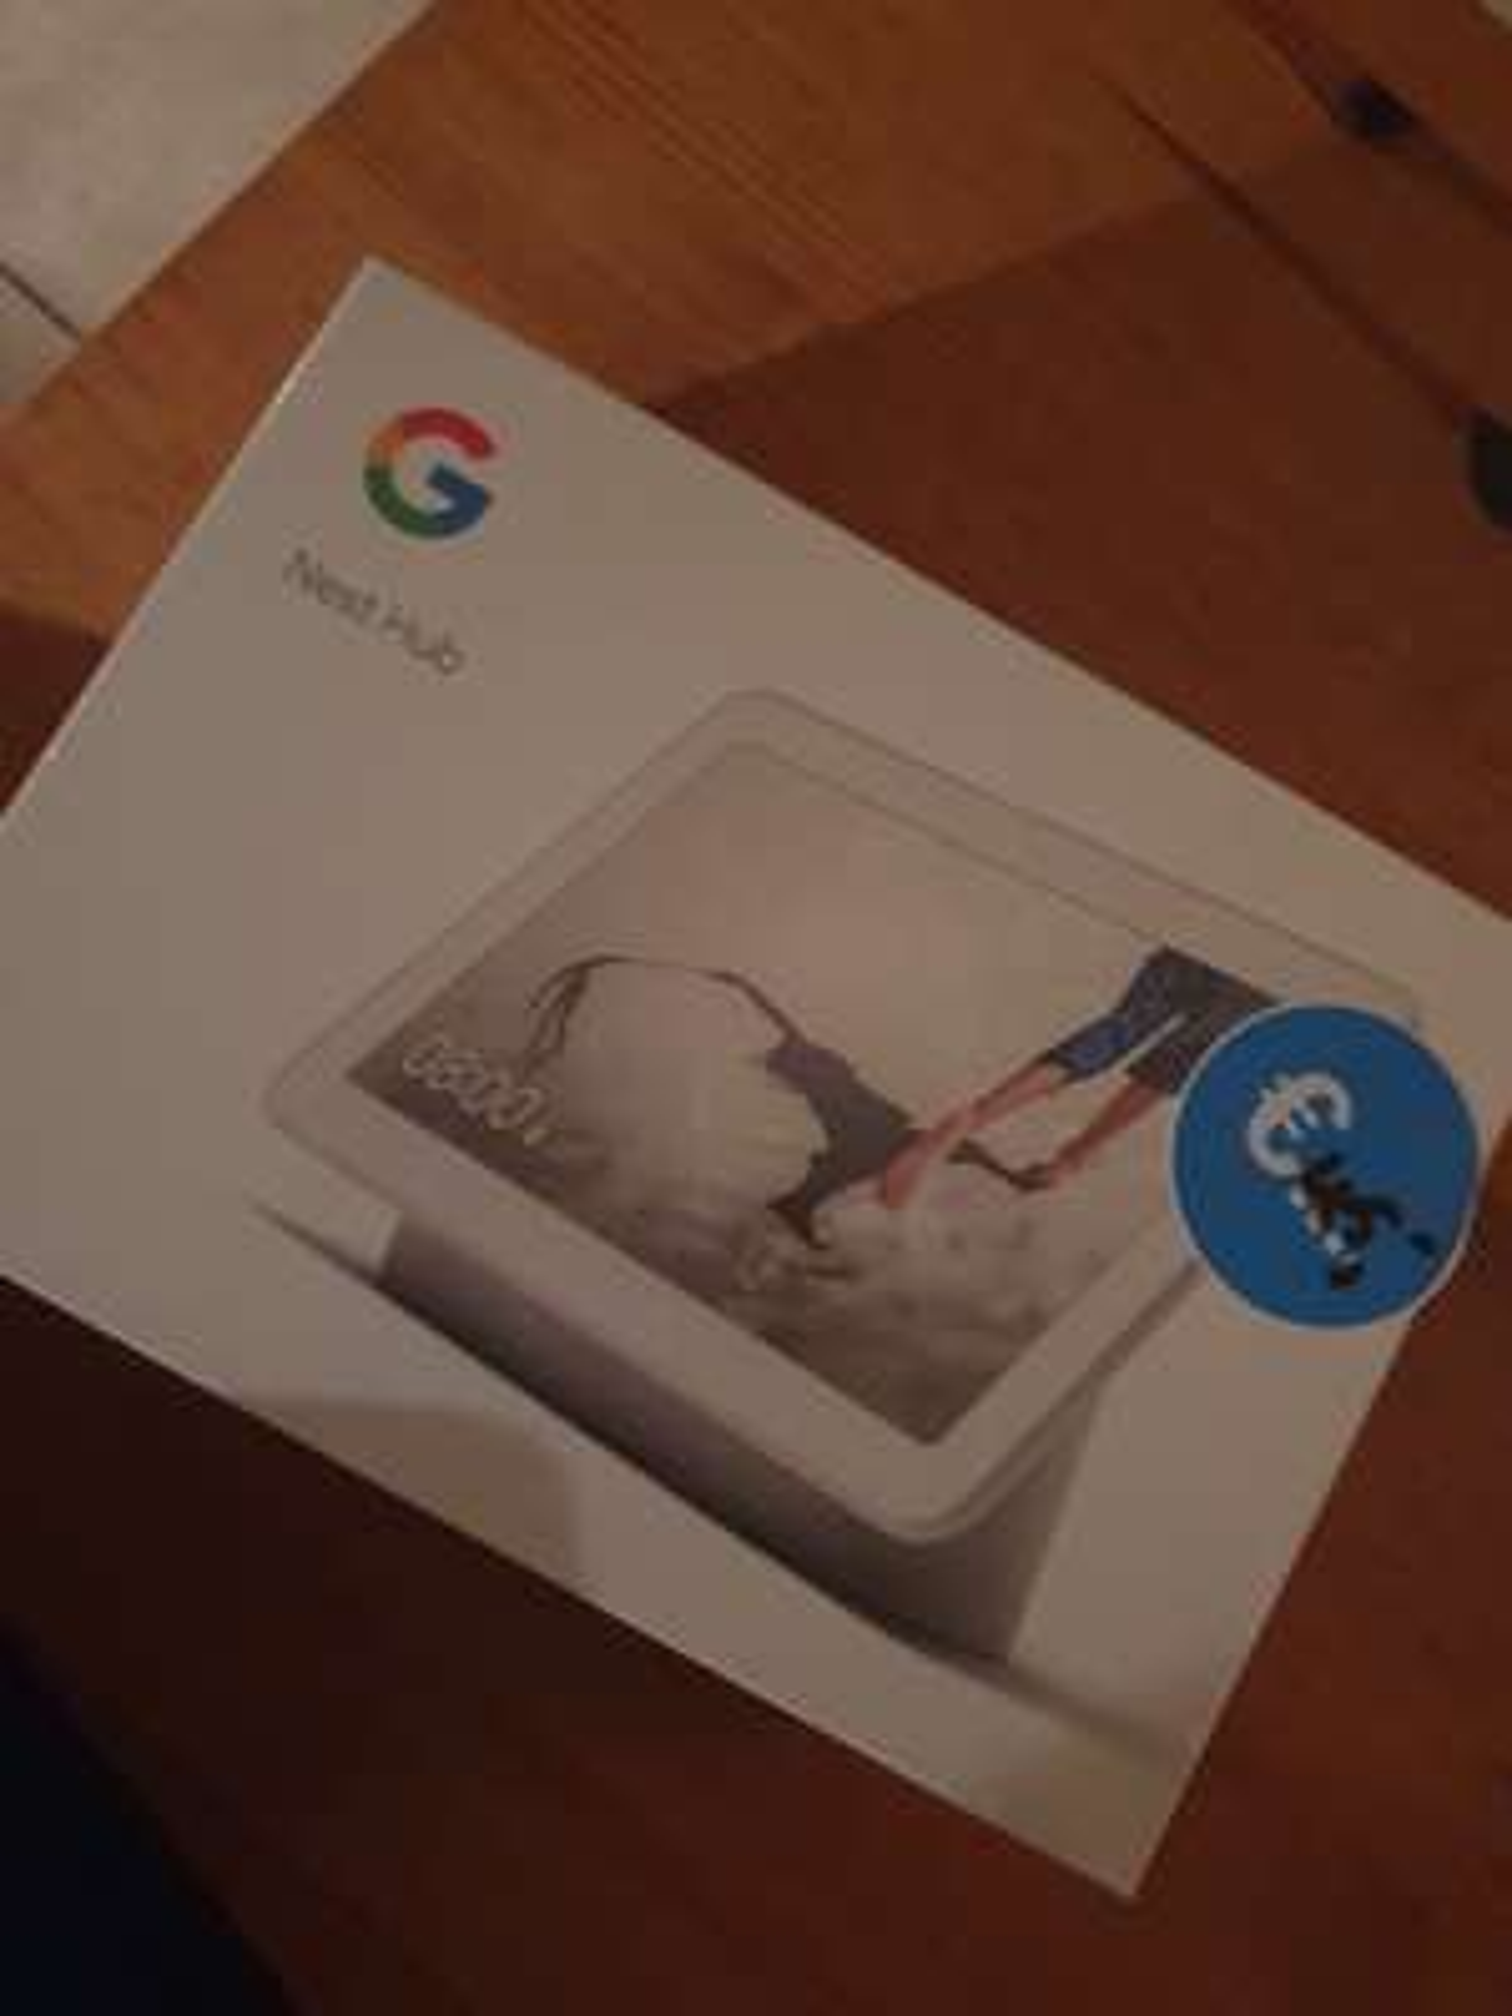 (LOKALE aanbieding) Google nest hub Albert heijn